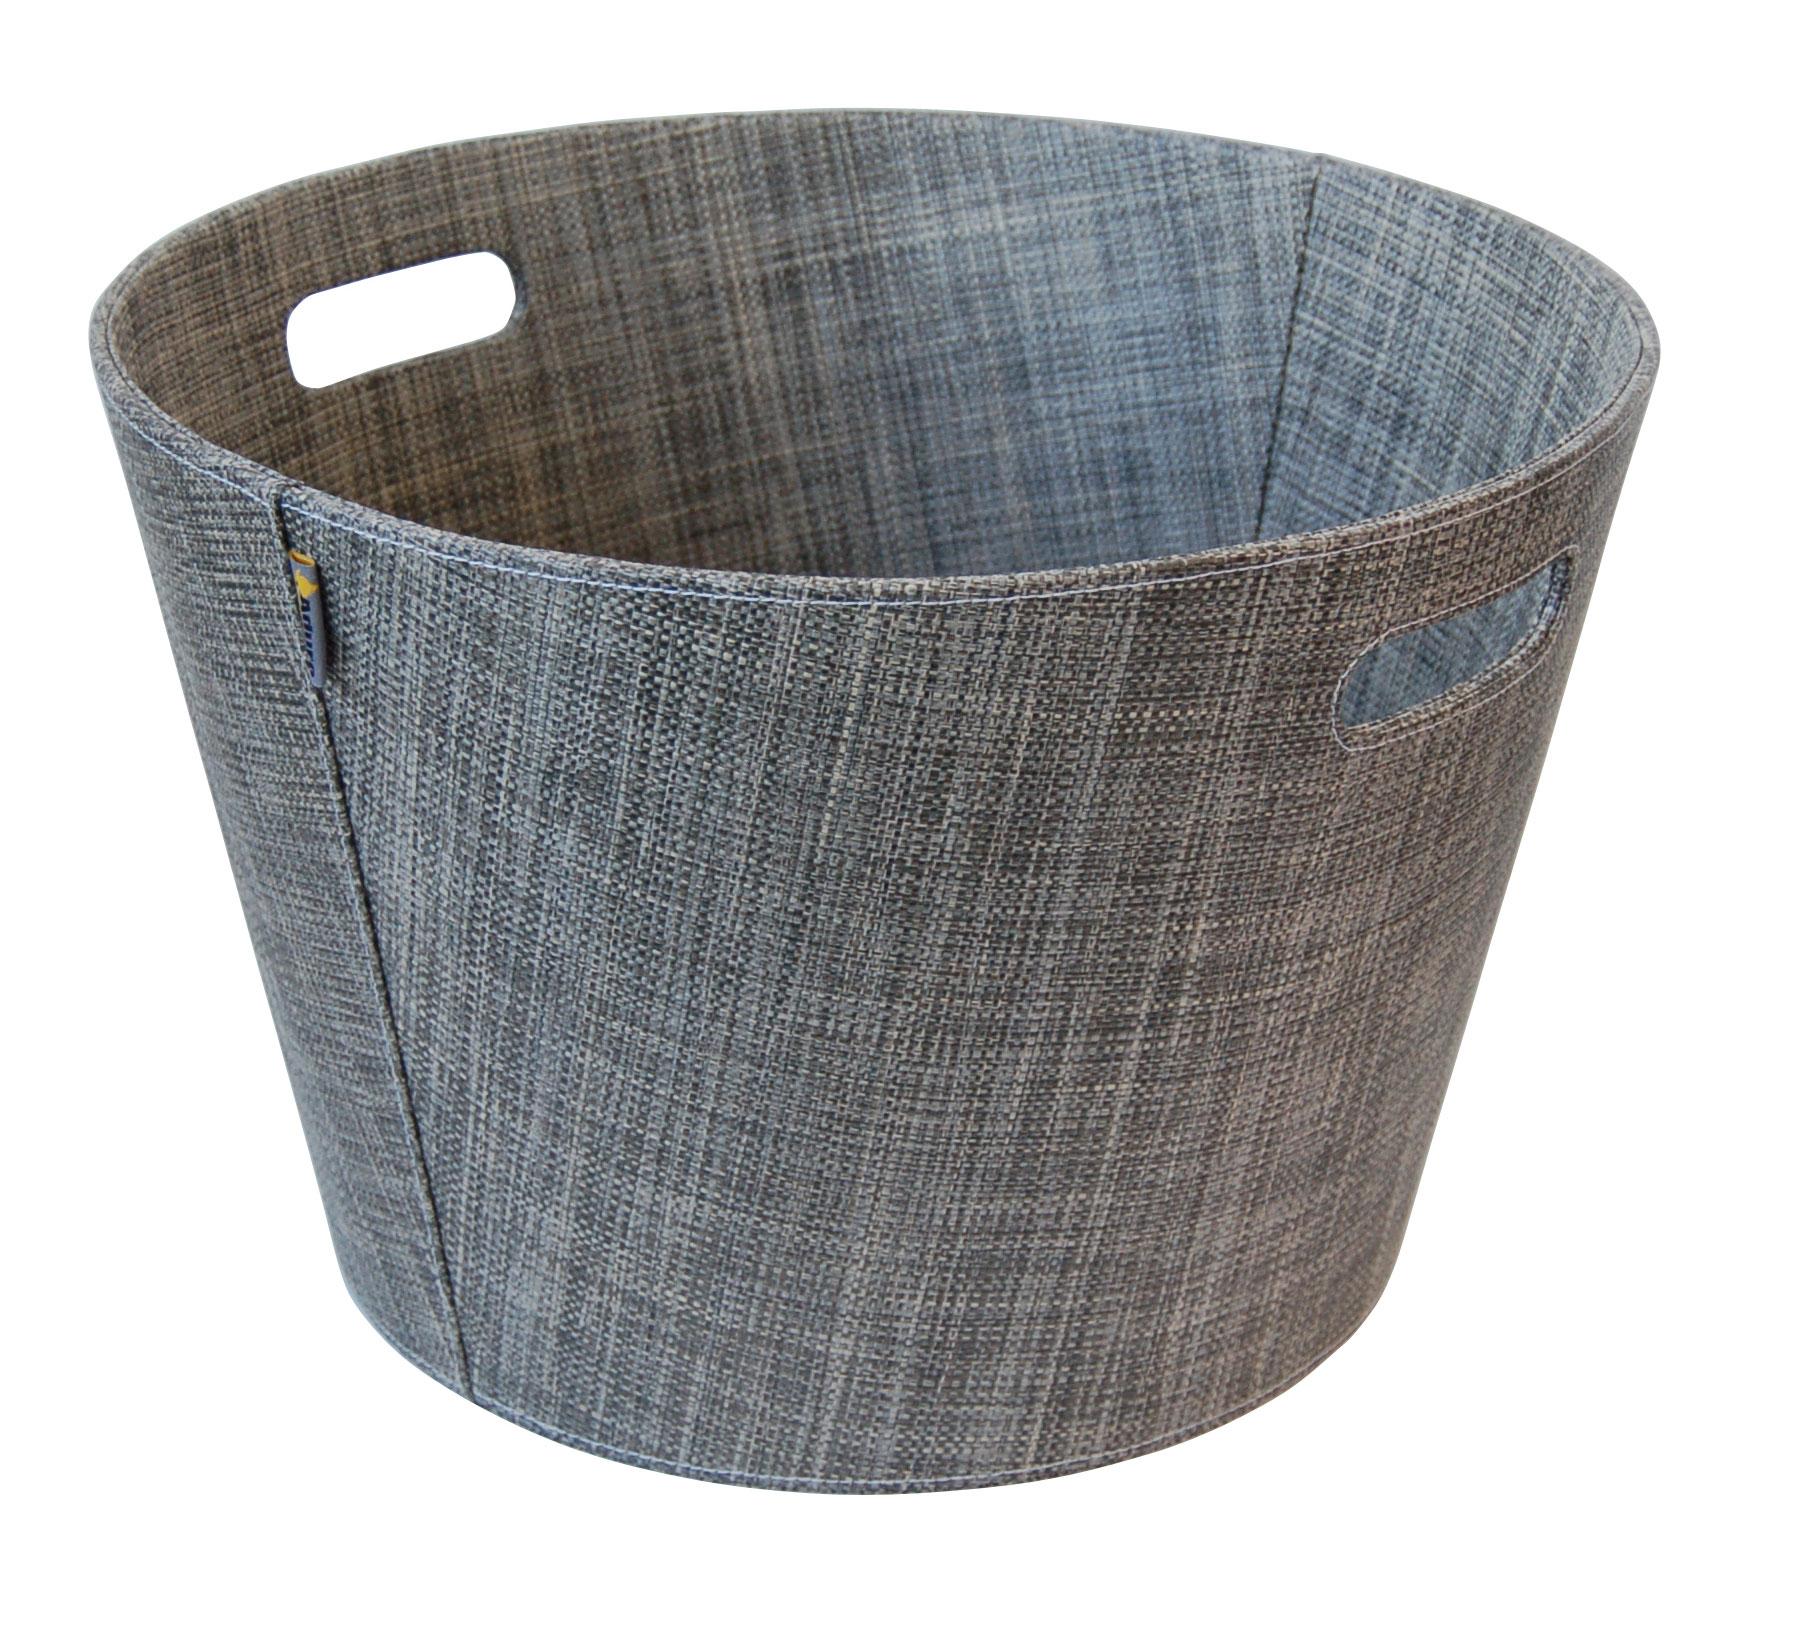 Holzkorb / Kaminholzkorb PET khaki melange Ø45cm Bild 1